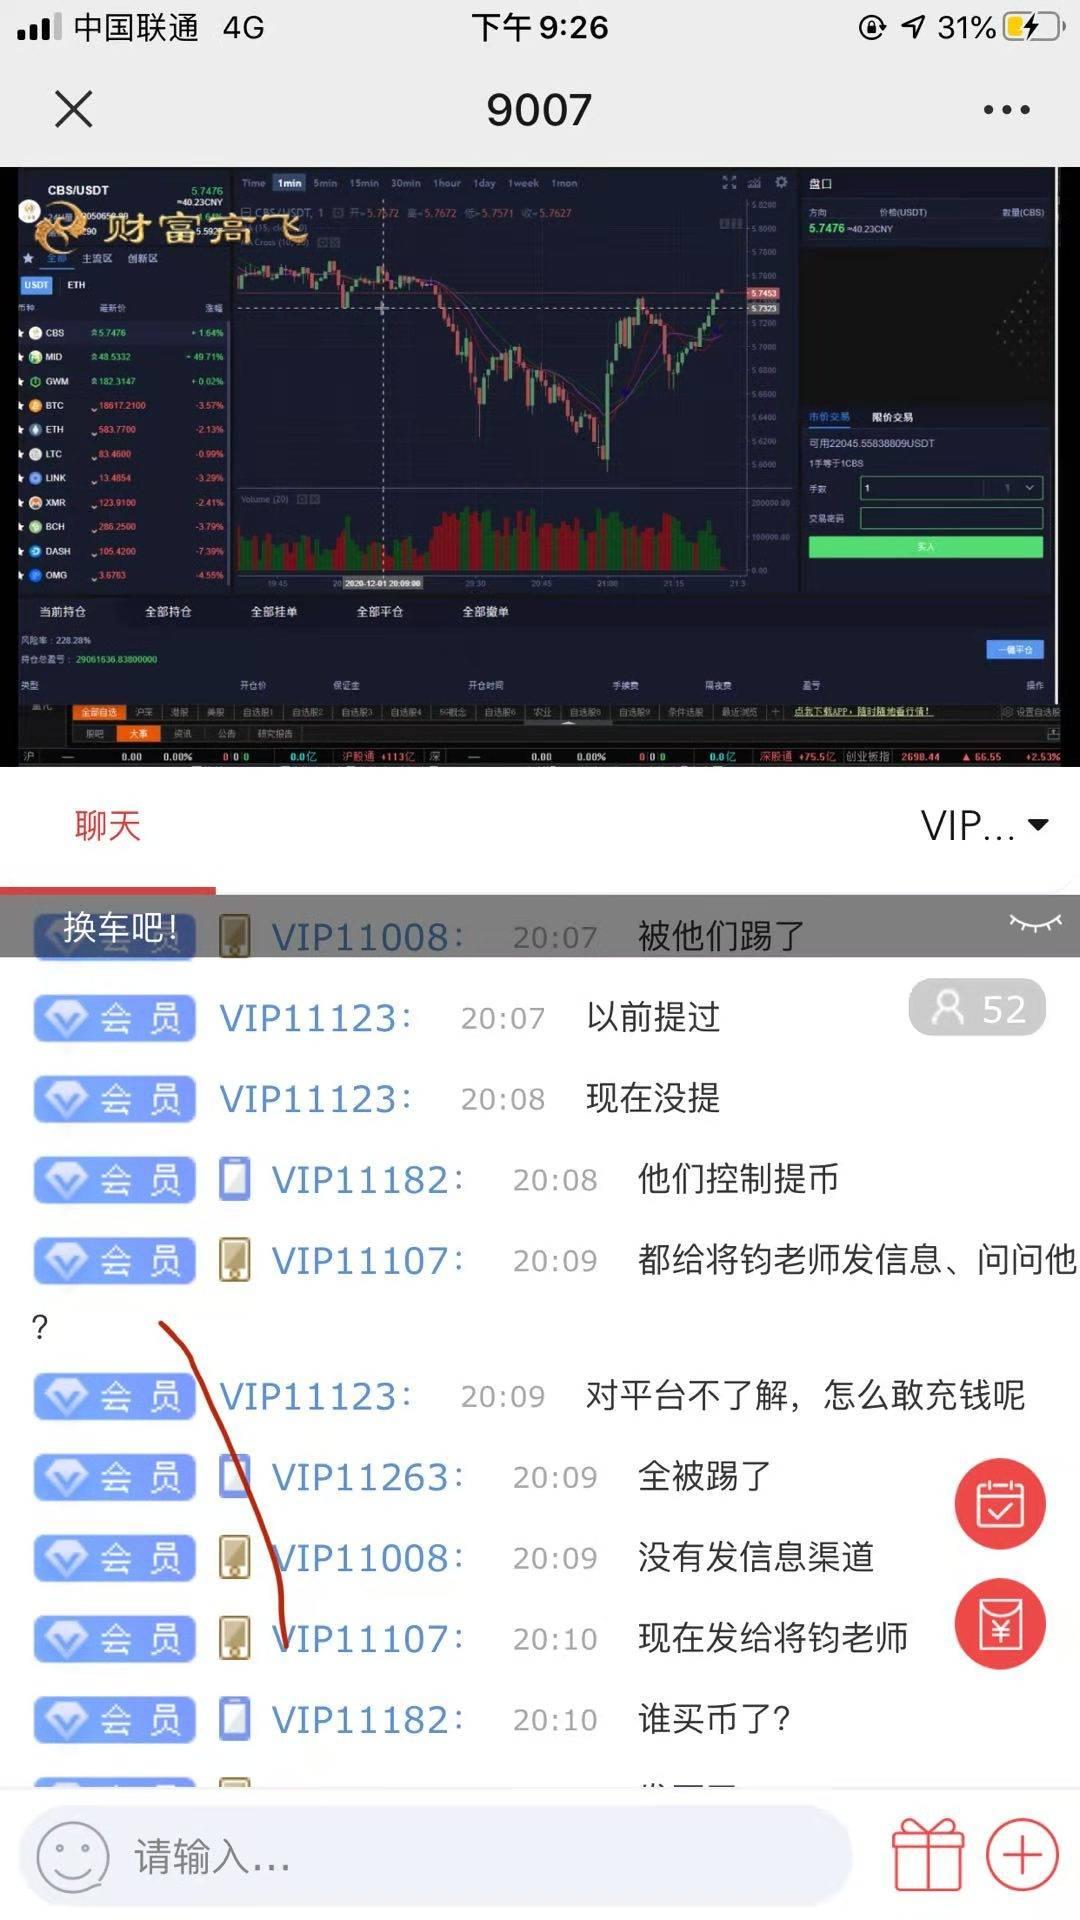 gdp数字交易平台_2021年中国数字经济行业市场规模预测 附图表